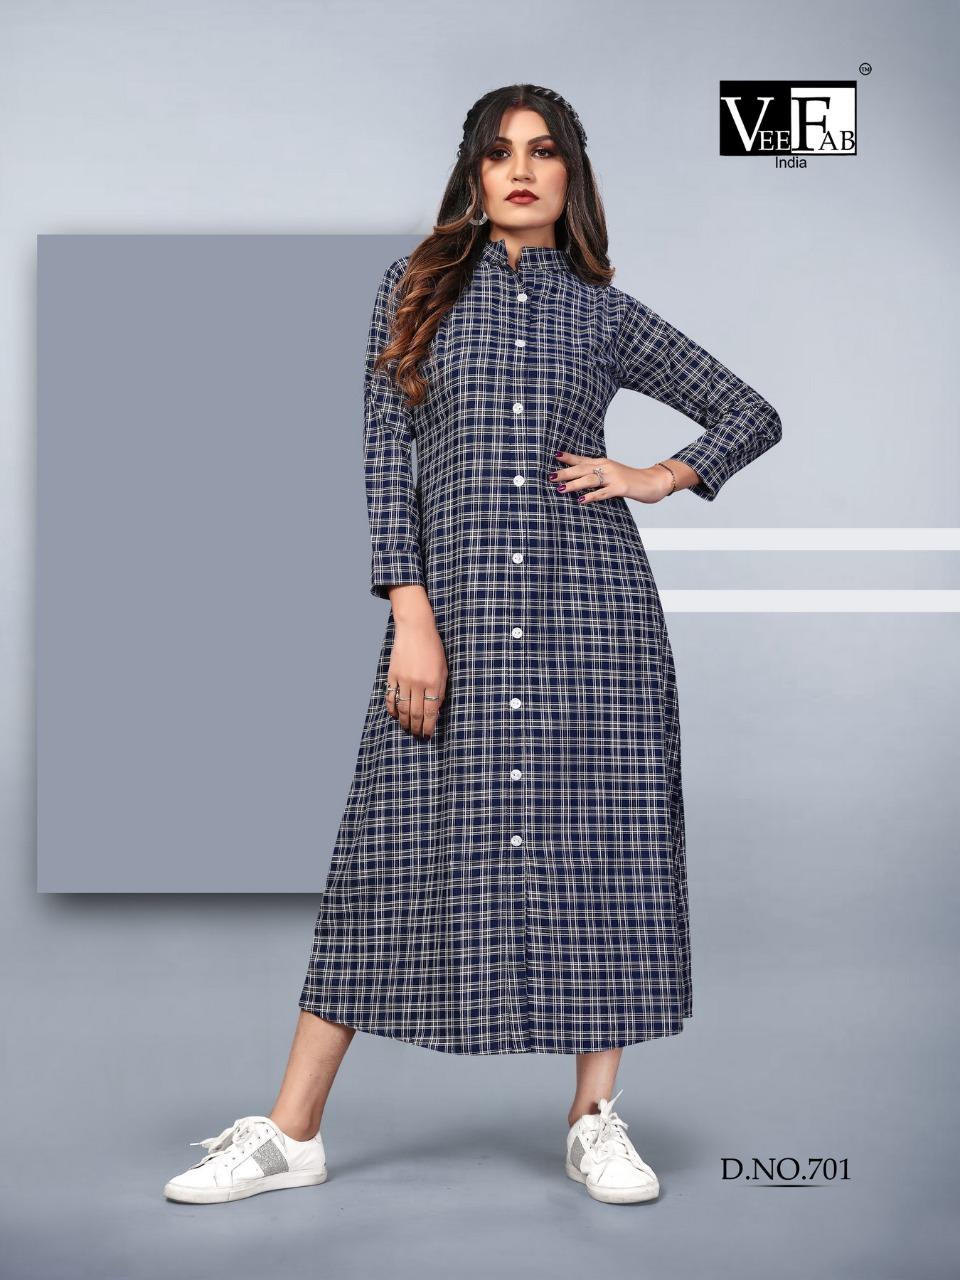 Vee Fab Winter Grace Vol 7 Designer Cotton Twirl Long Kurtis Wholesale